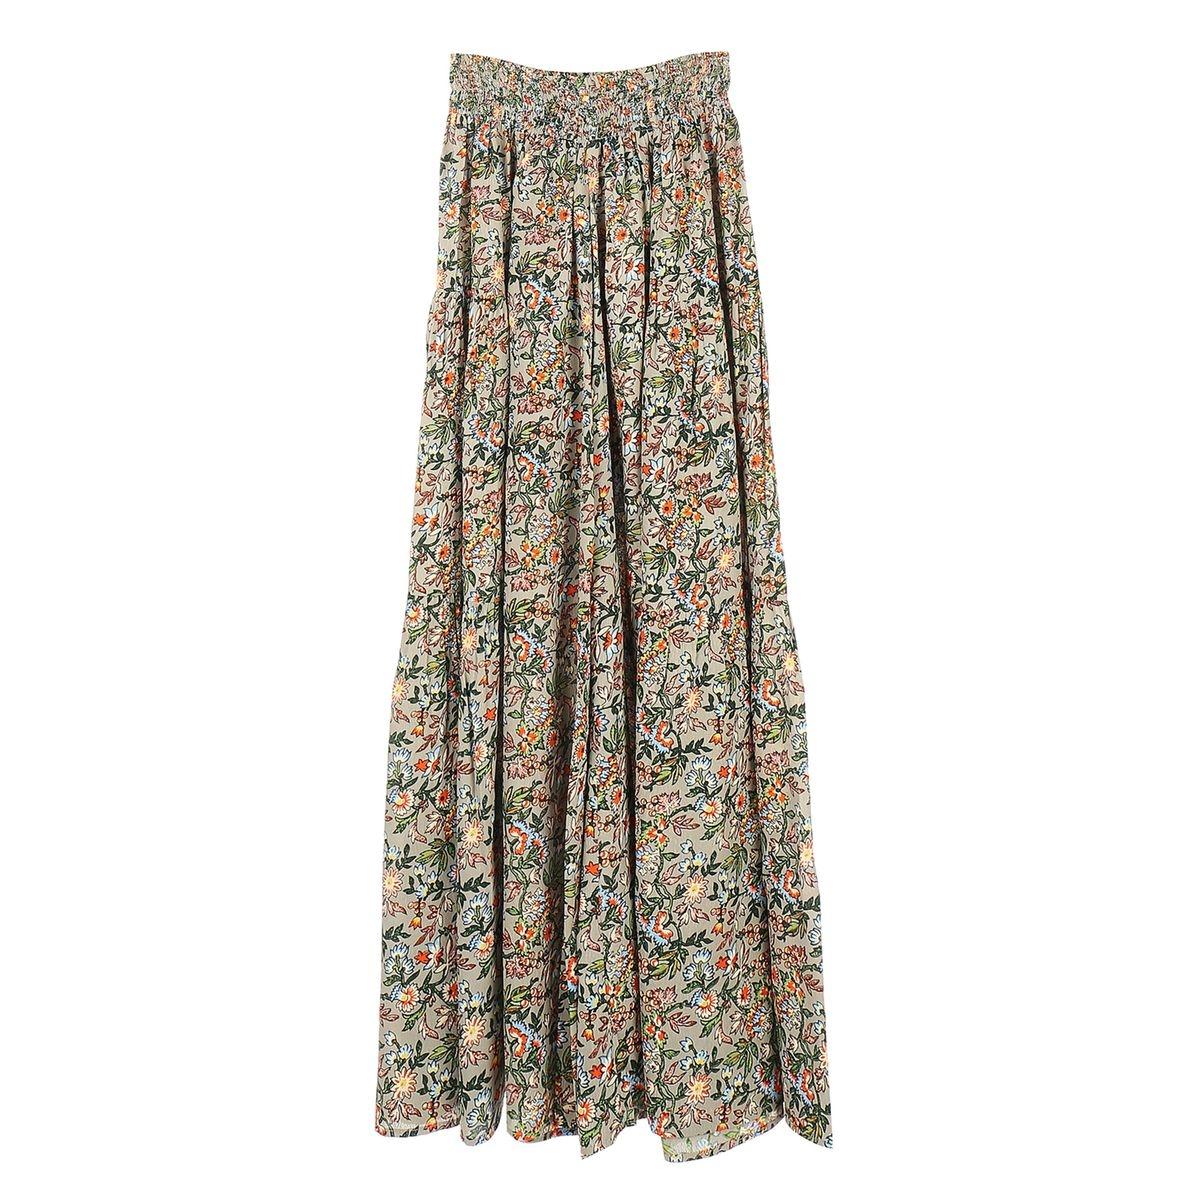 Pantalon loose, large